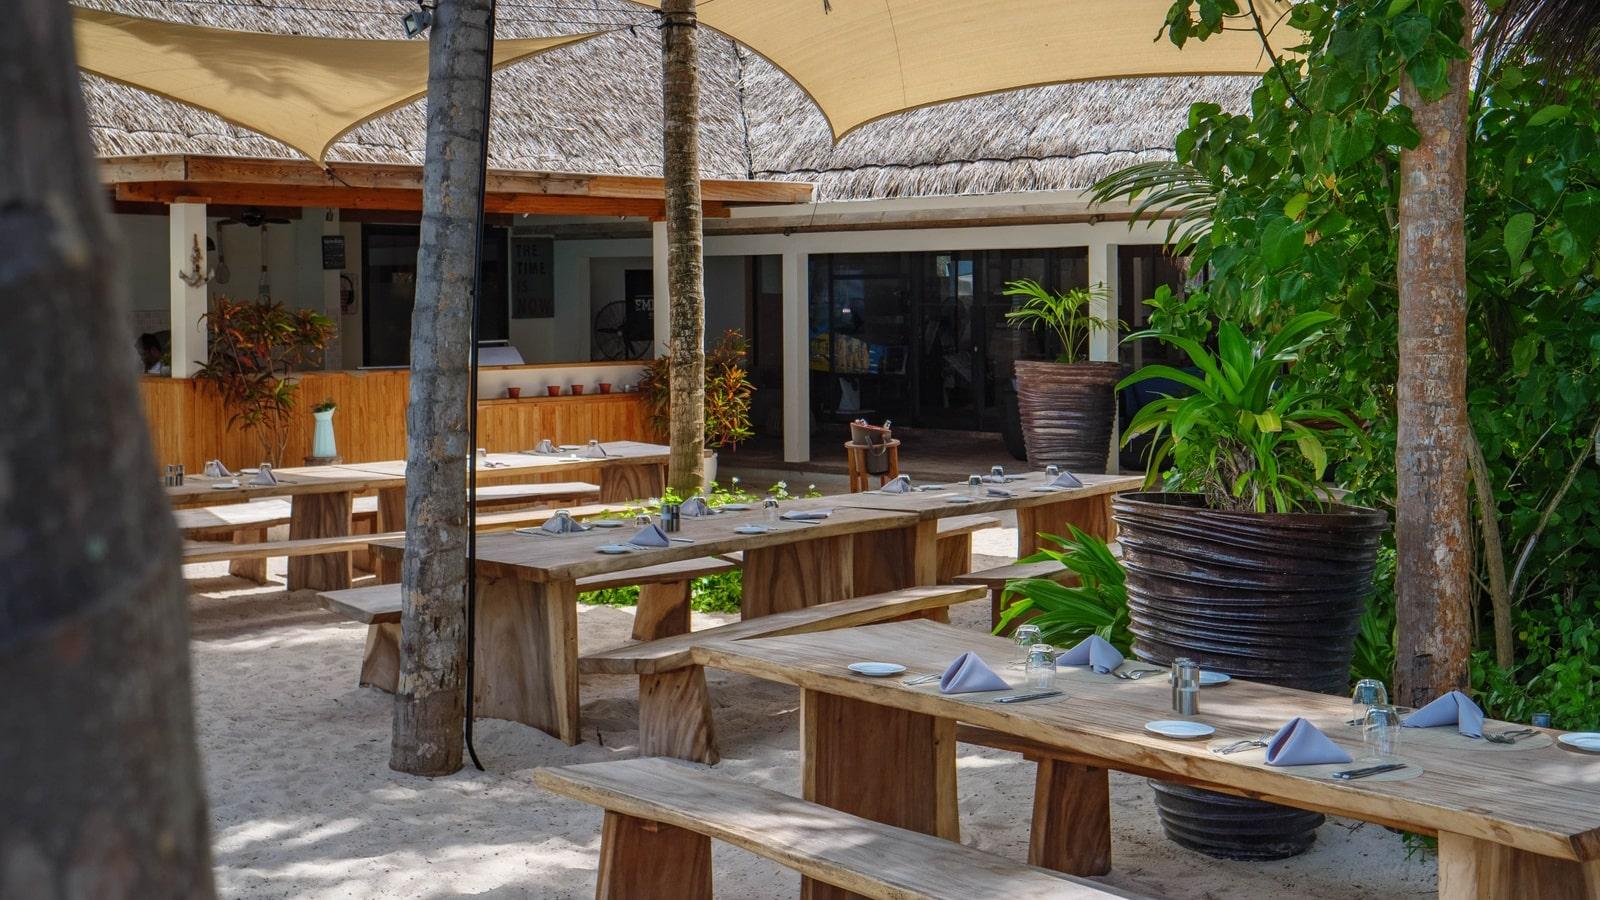 Мальдивы, отель Amilla Fushi Maldives, бар Emperor Beach Club